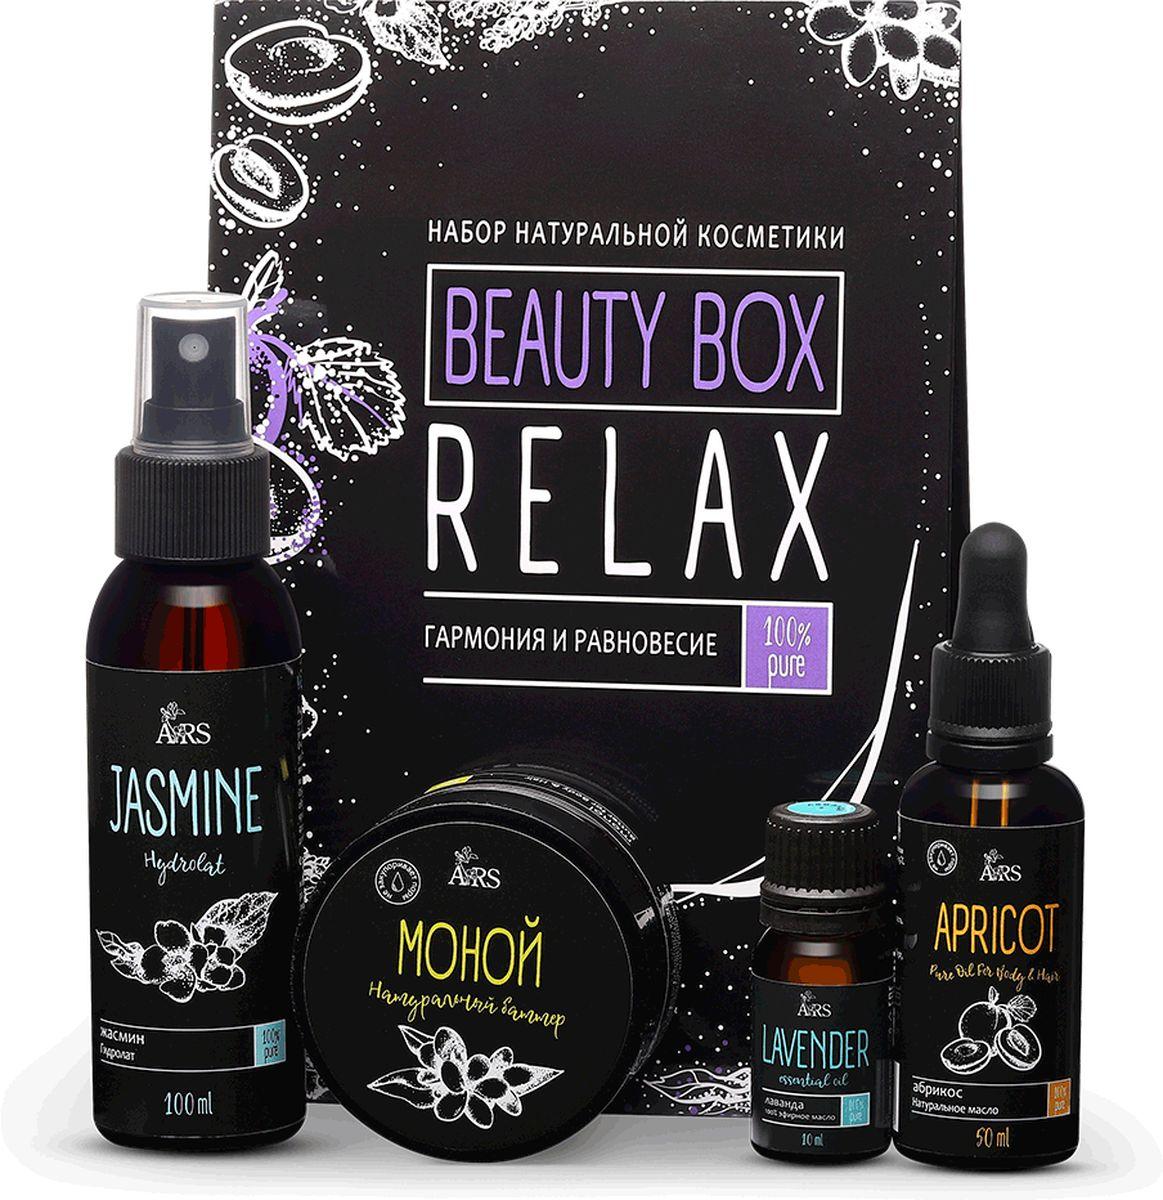 Base to Beauty Набор натуральной косметики Beauty box Relax (гармония и равновесие) gb4045d to 220